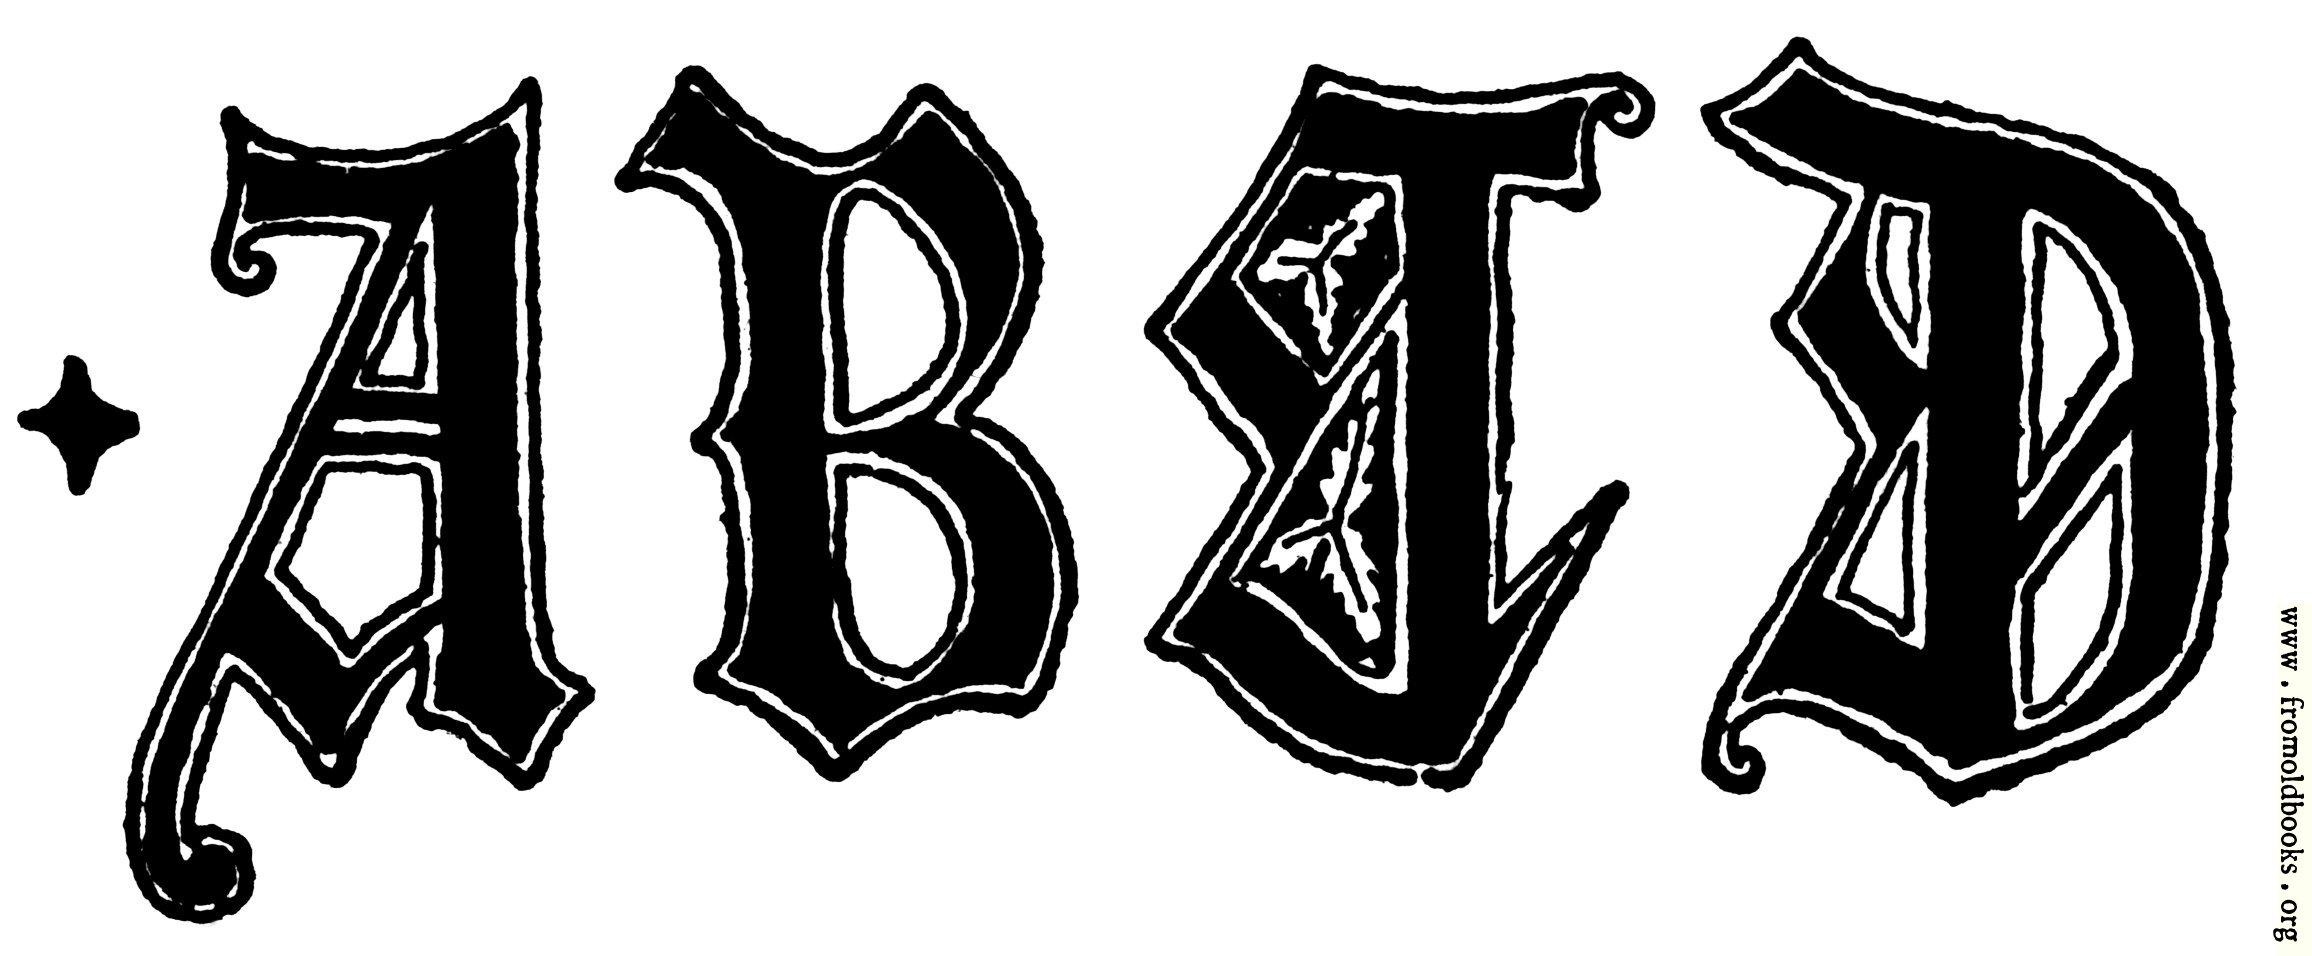 Alphabet Letters in Graffiti | Alphabet Letters Org